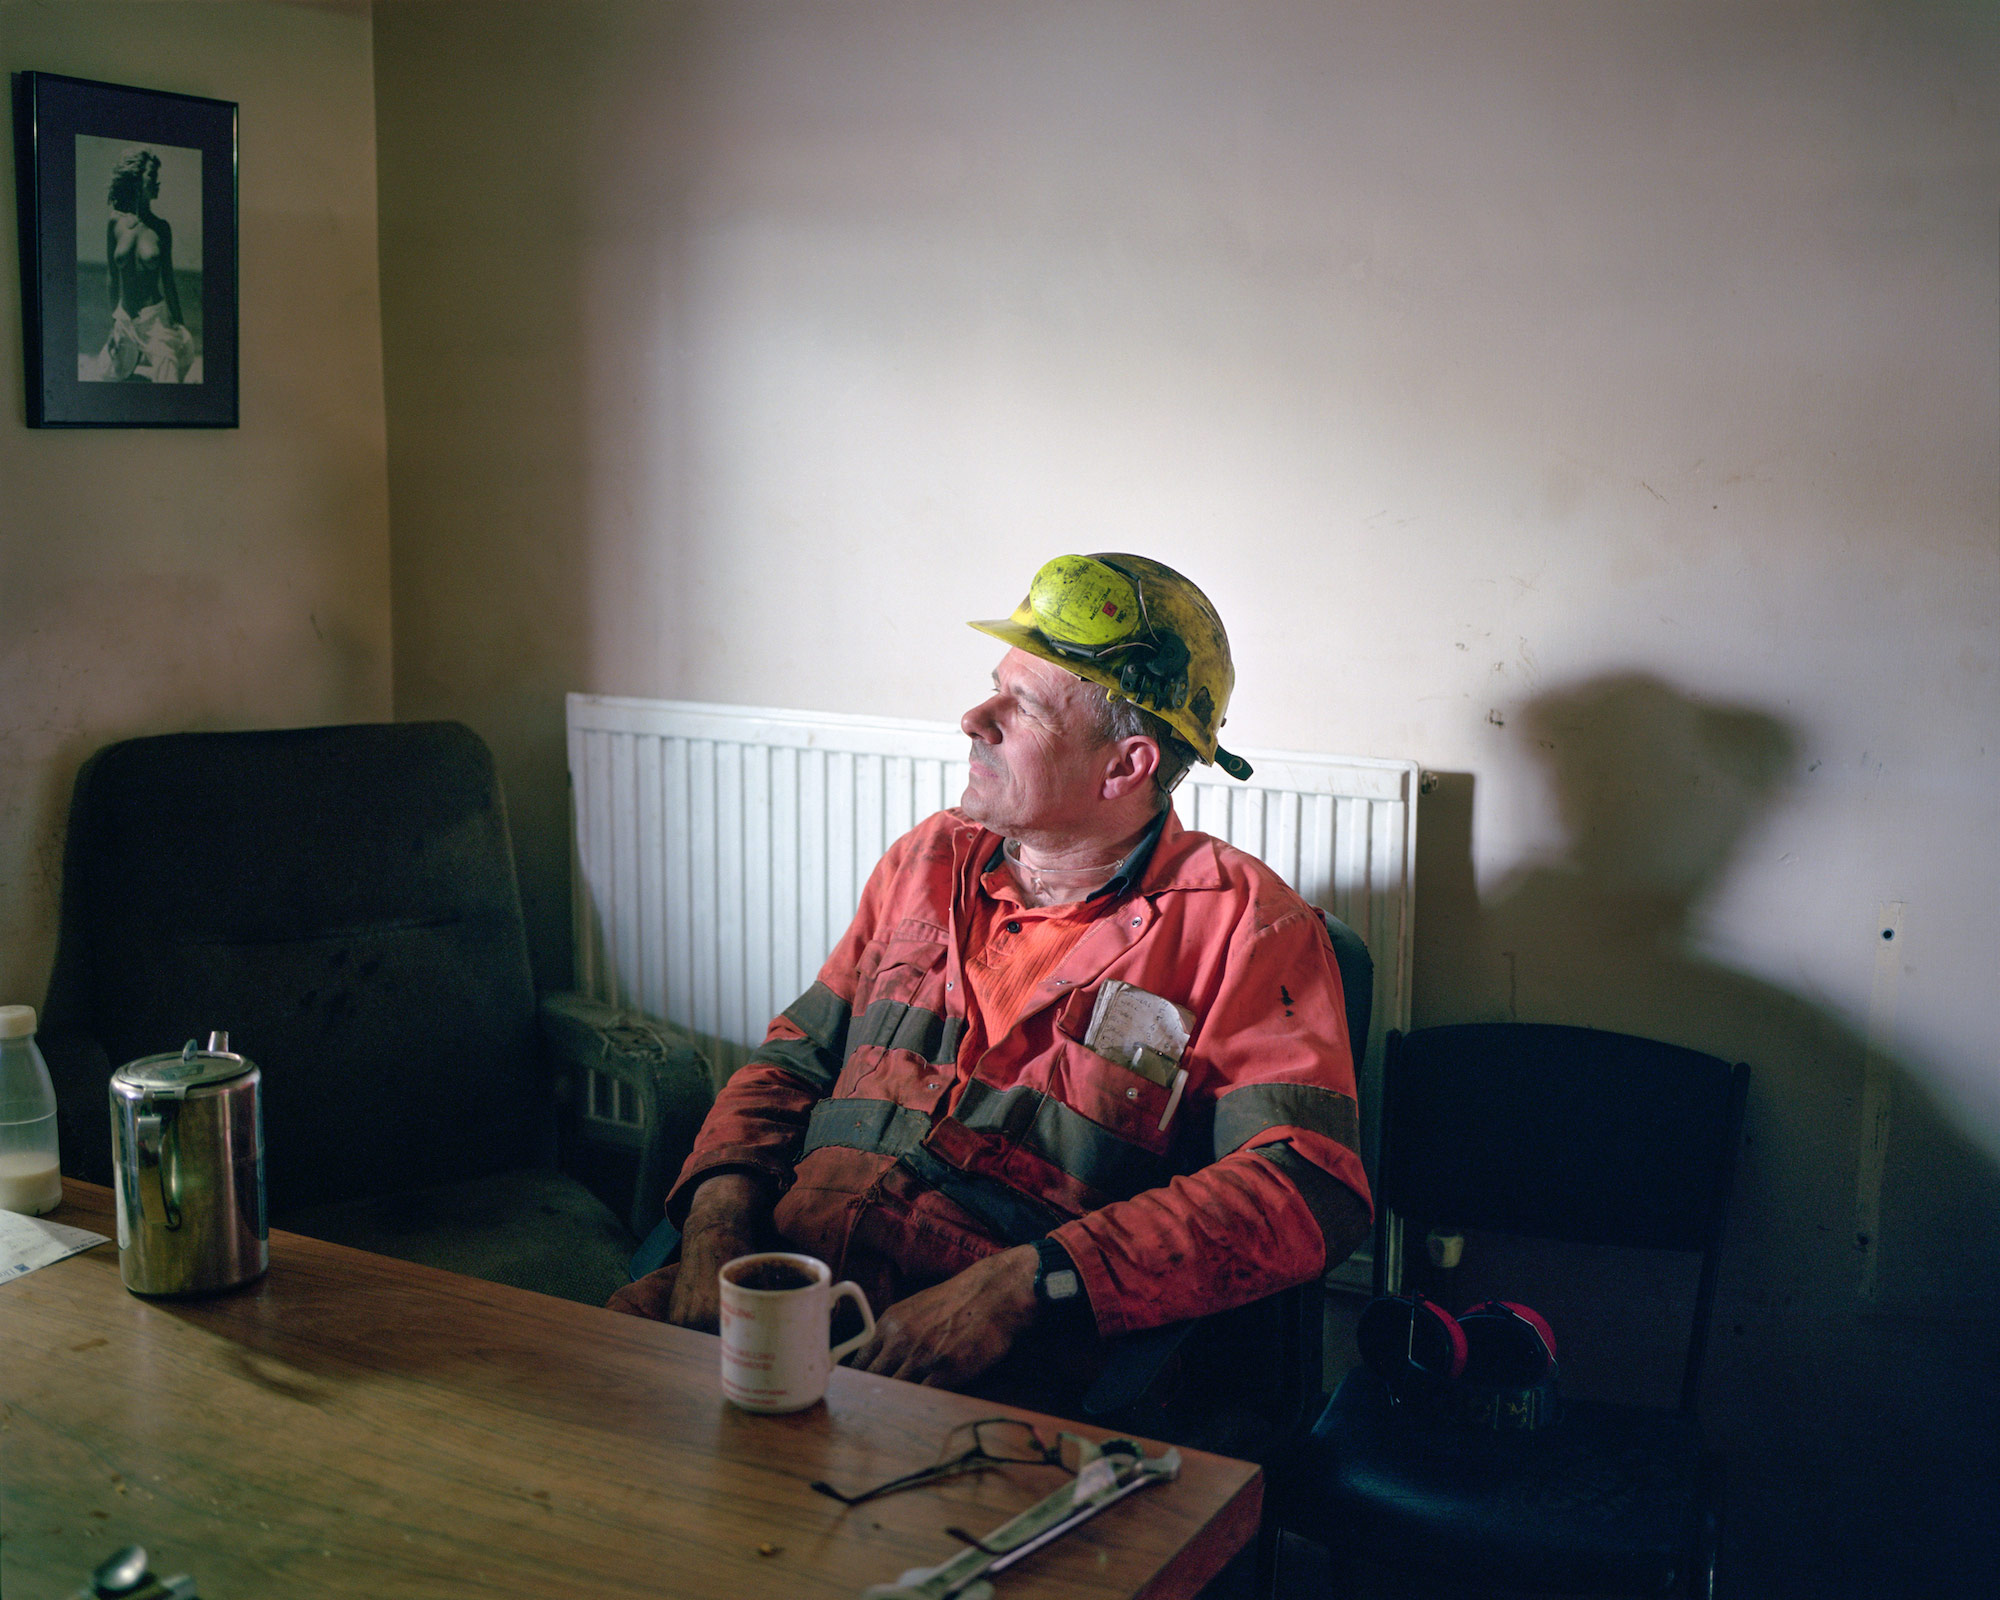 Ashley taking a tea break, Thoresby Colliery, Nottinghamshire.